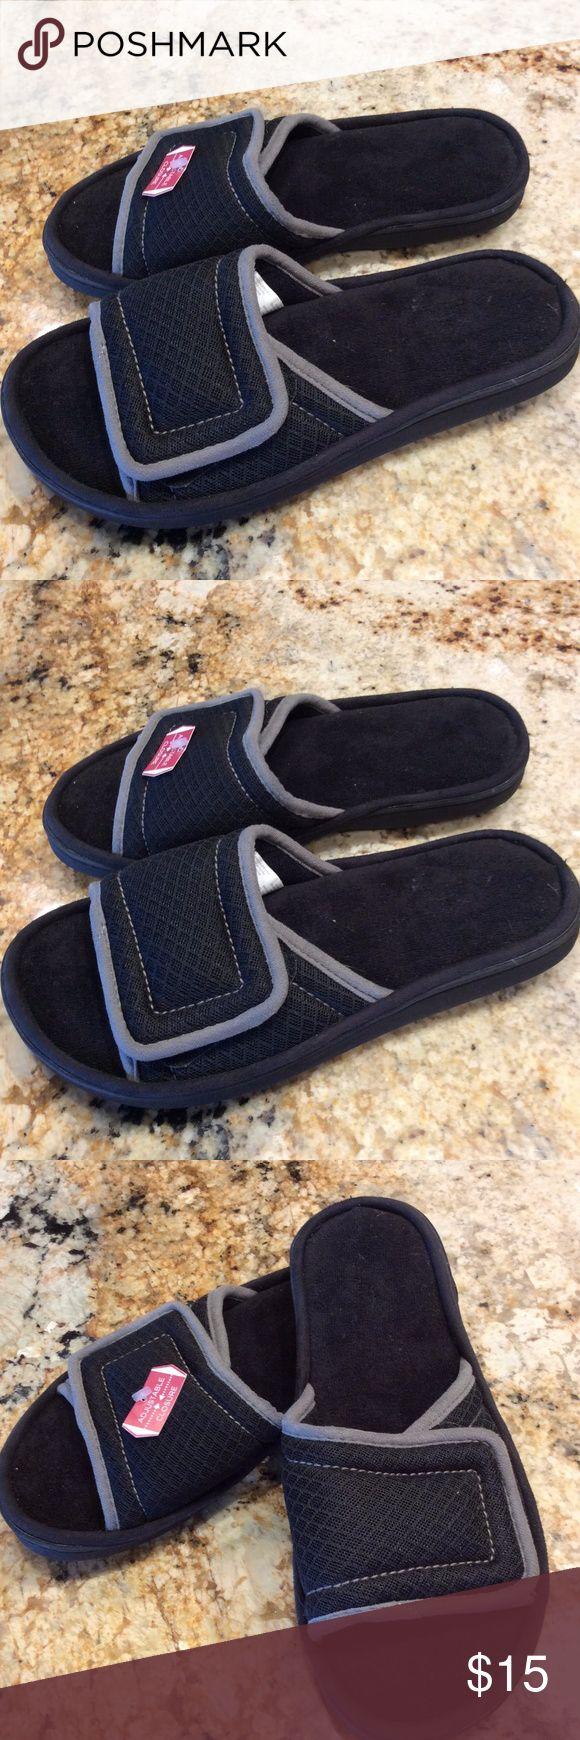 Mens Dear Foams Slippers House Shoes size 7/8 Velcro adjustable close.  Cushy Dear Foams Shoes Loafers & Slip-Ons